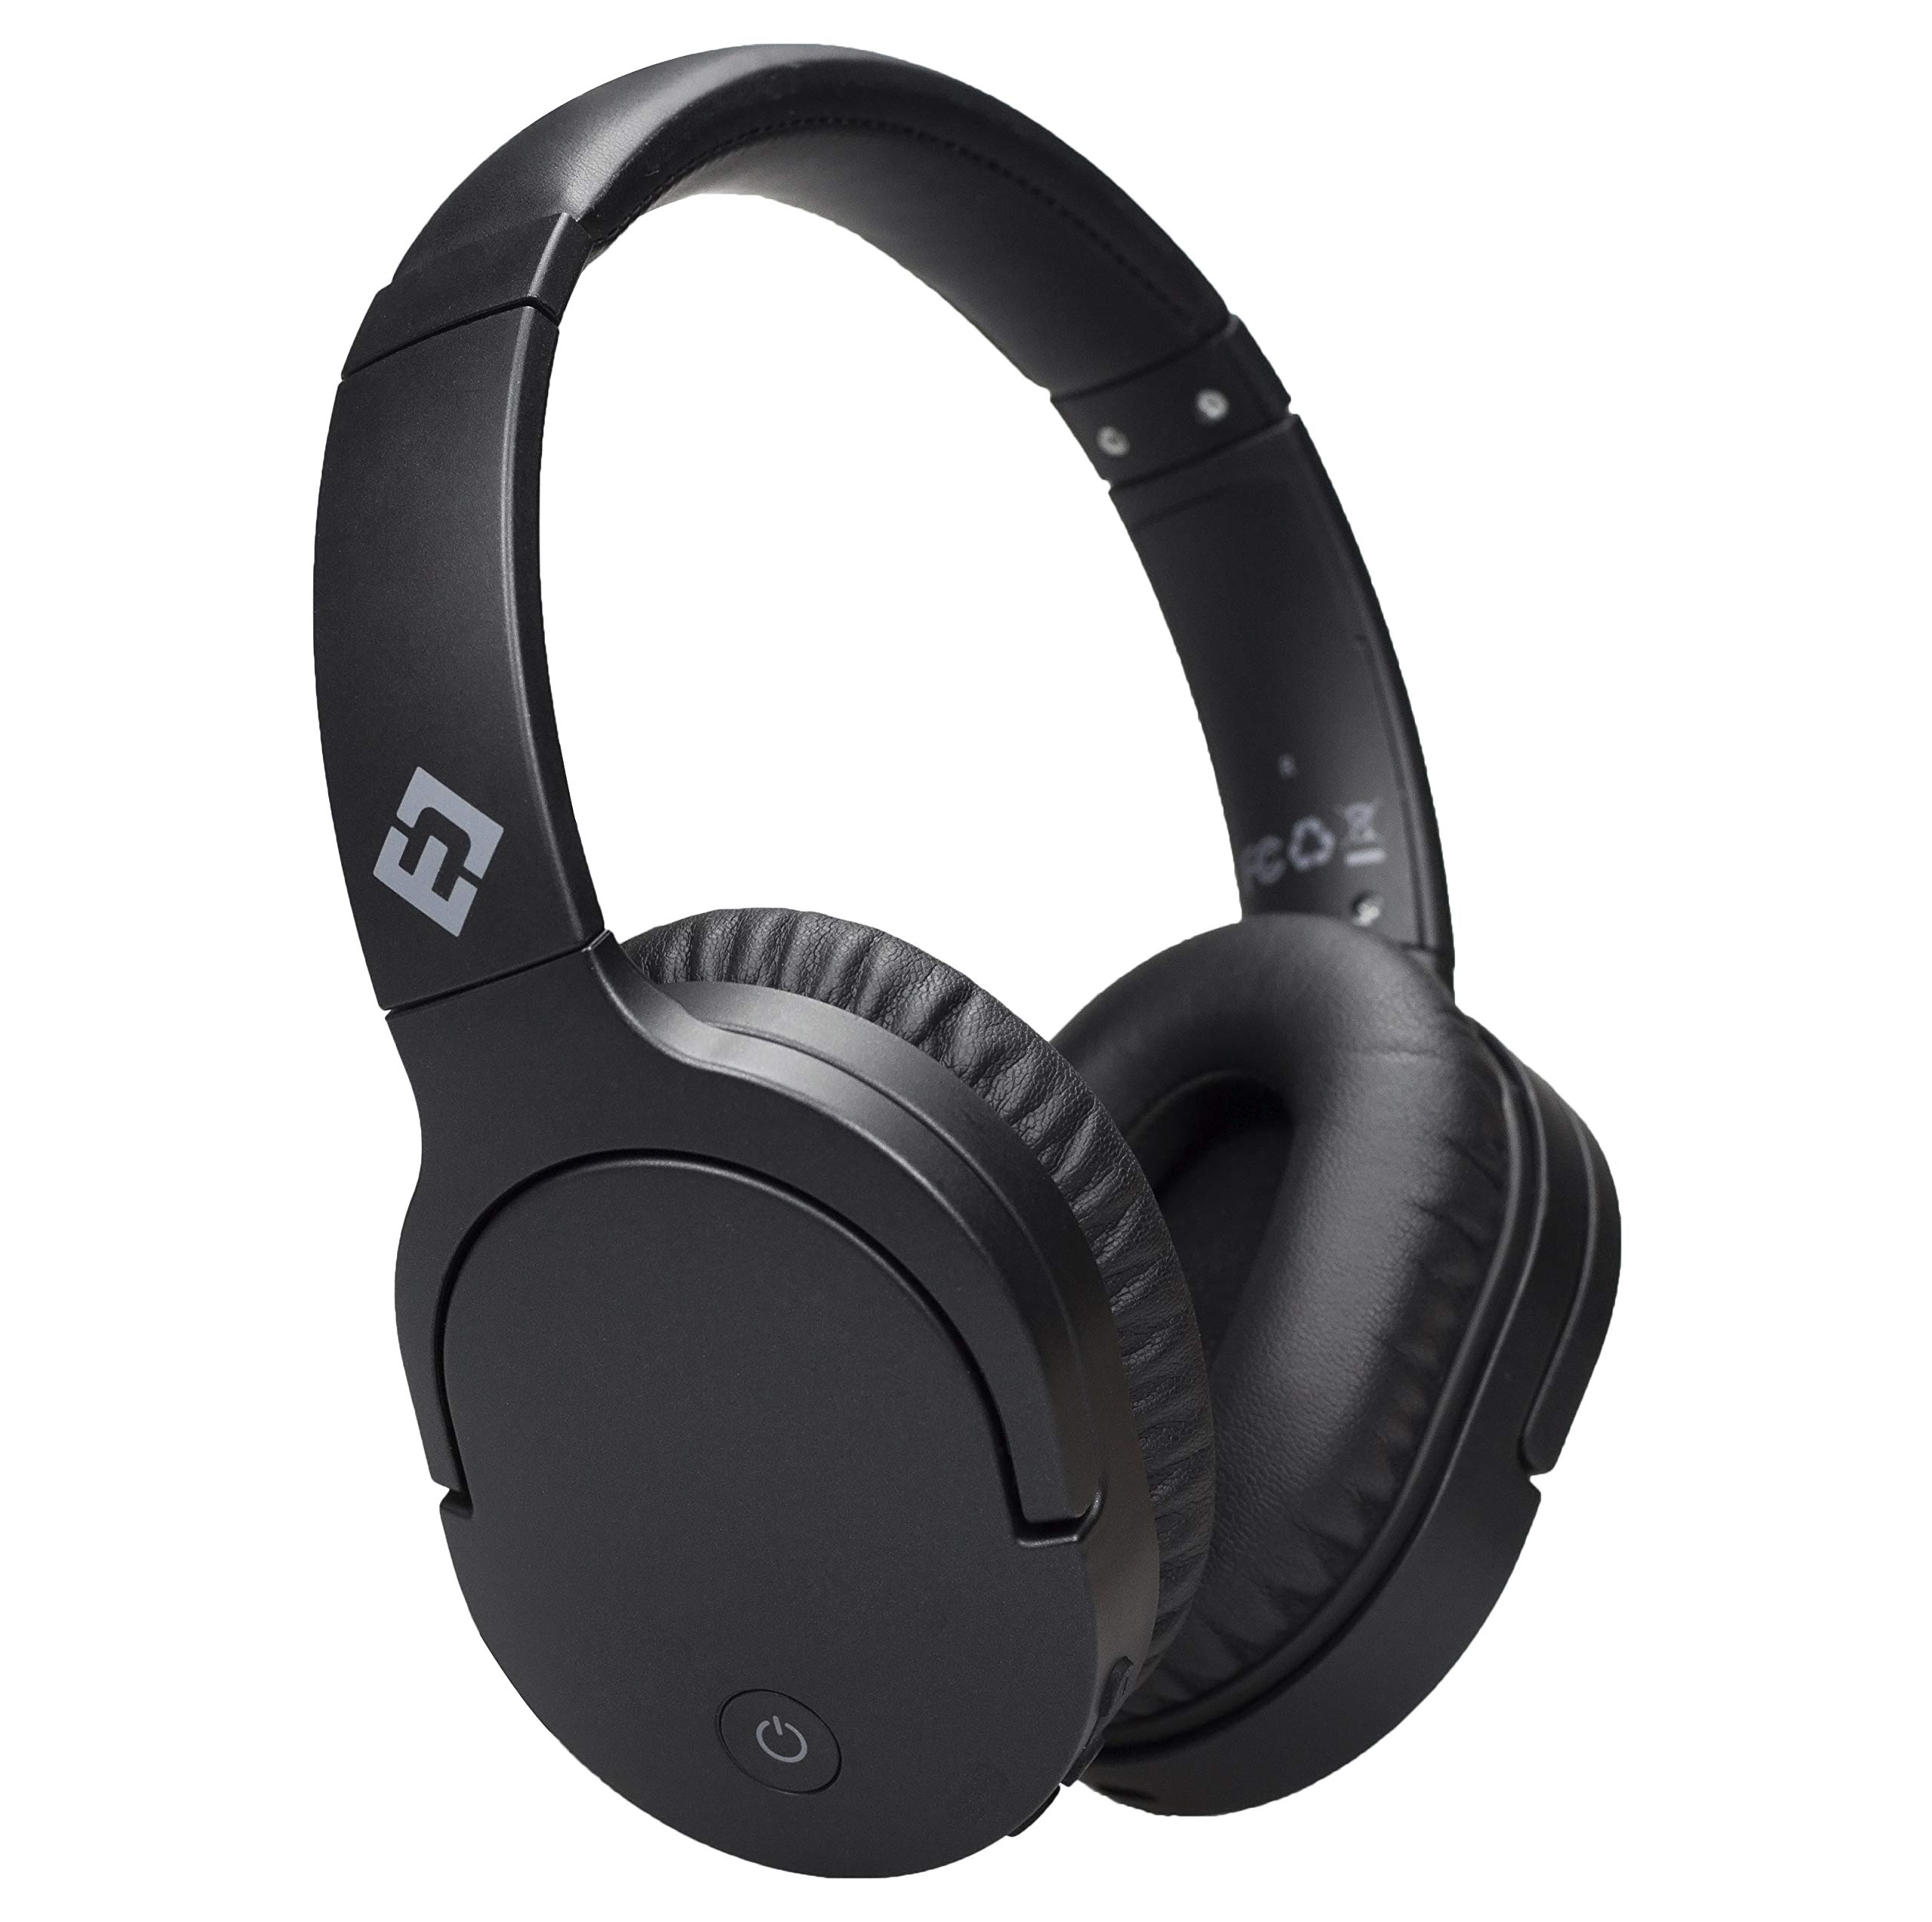 Auriculares Cancelacion de Ruido Activa Headset Bluetooth 4.1 Mic Inalambrico Con Cable Confortable Plegable Stereo ANC